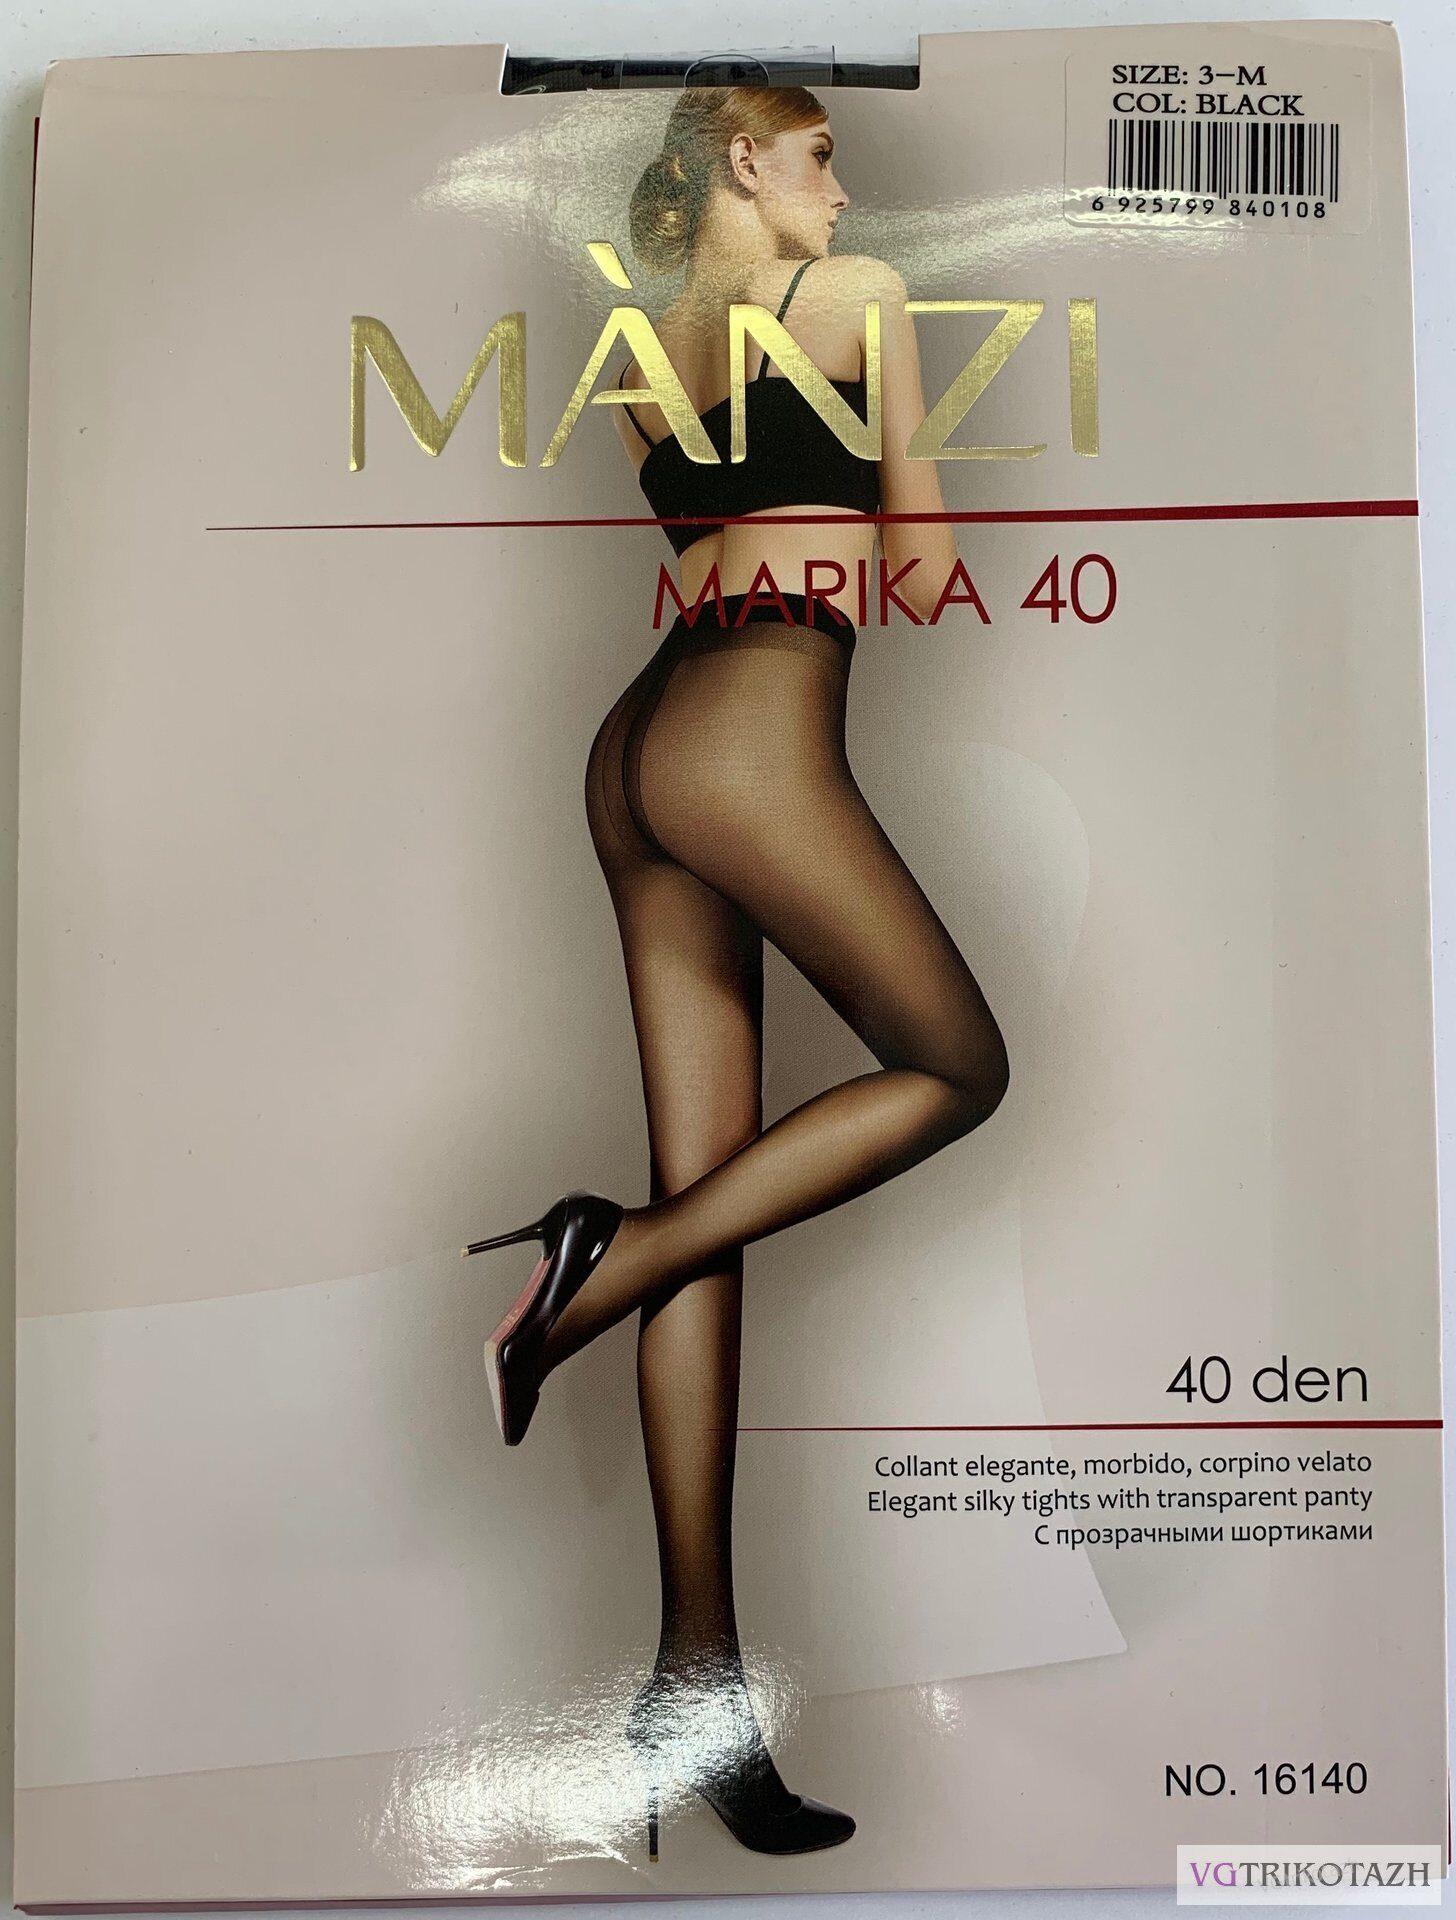 Elegant Women/'s Ladies Classic Tights CONTE Pantyhose NUANCE 15 Den S M L XL